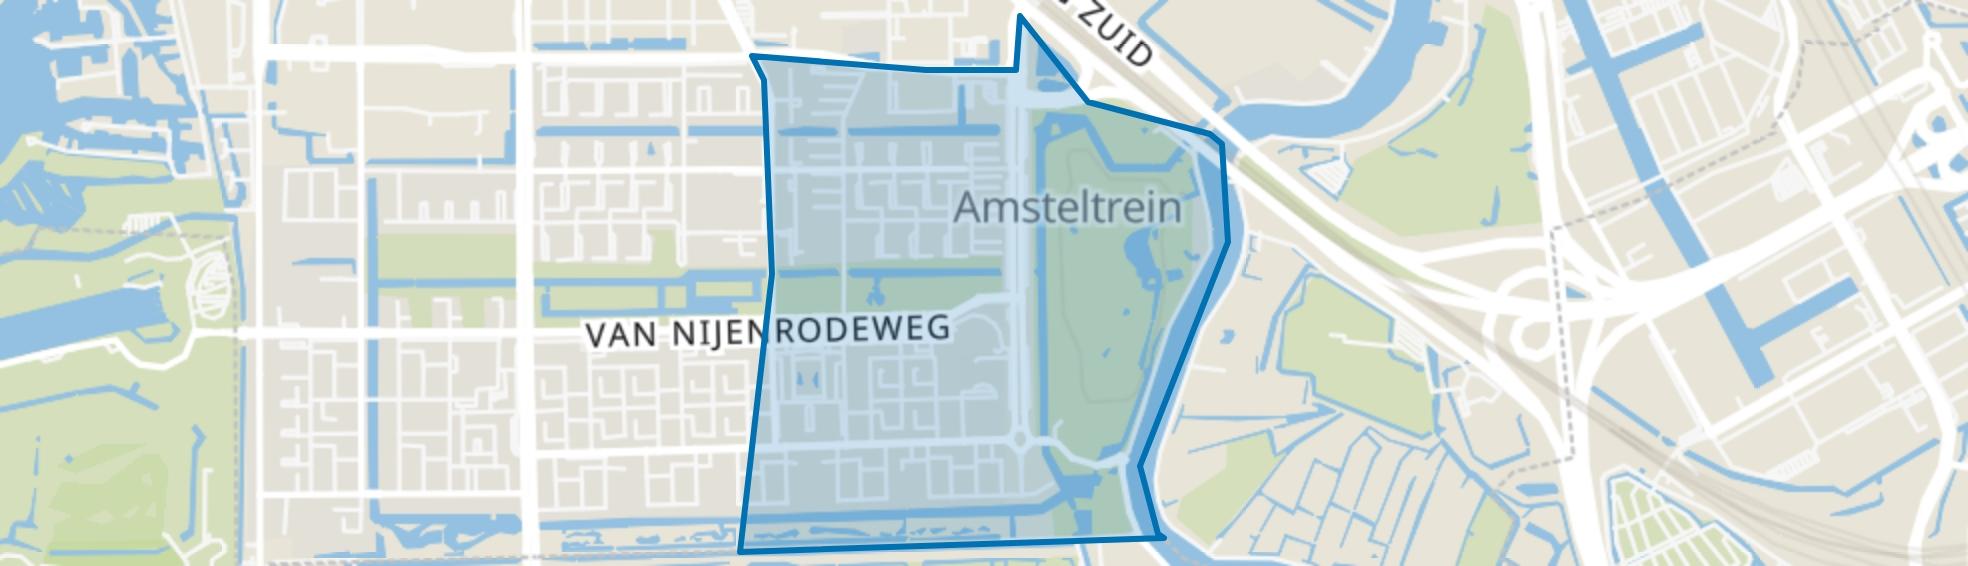 Buitenveldert-Oost, Amsterdam map